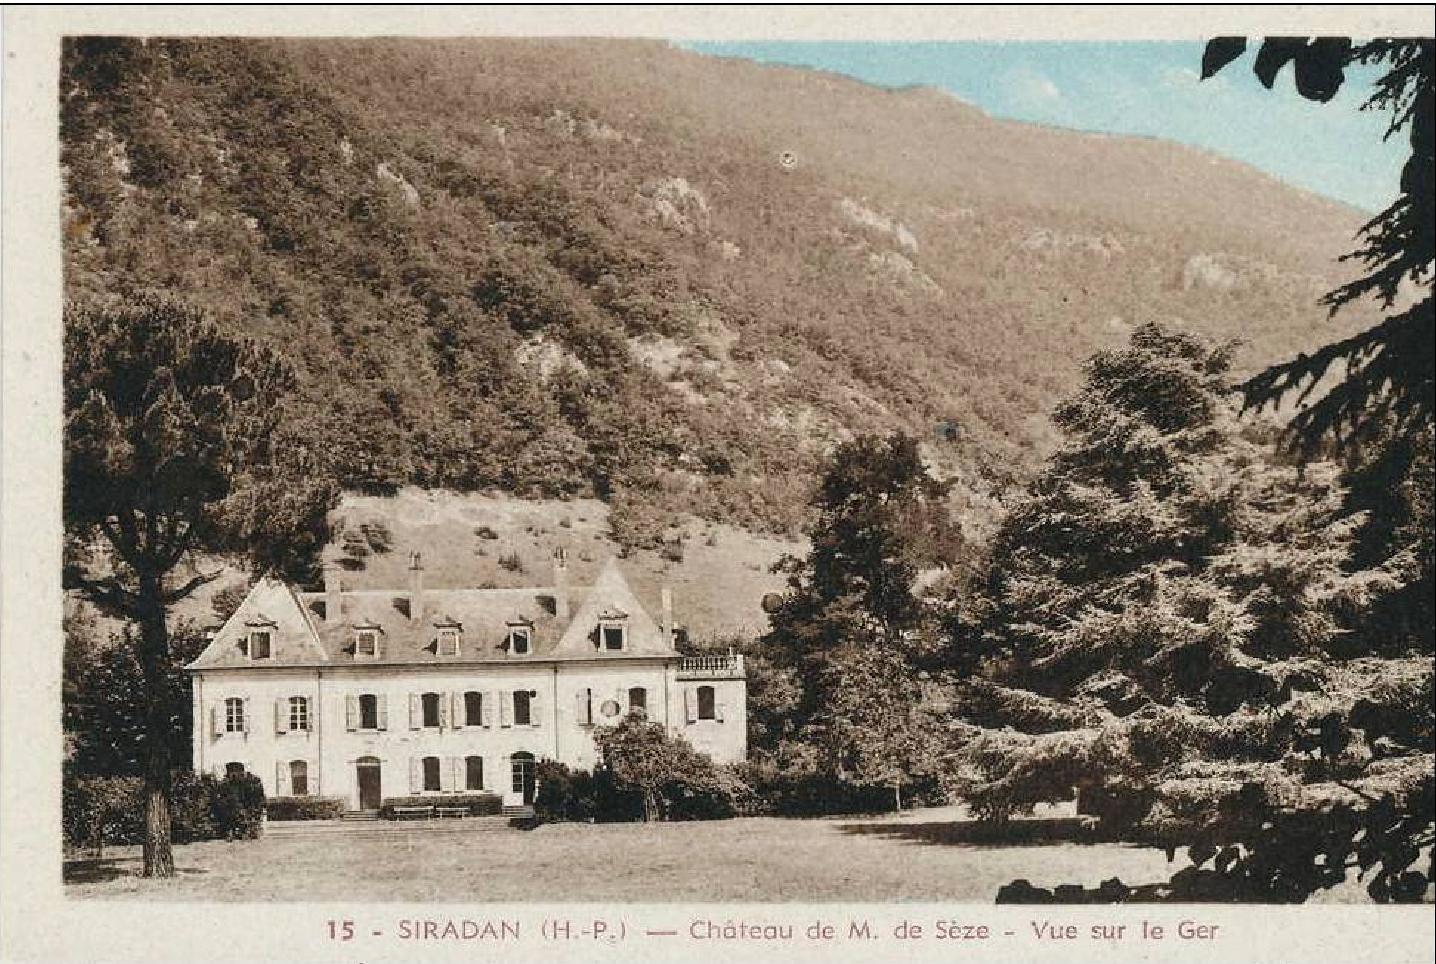 de Seze Postcard.png